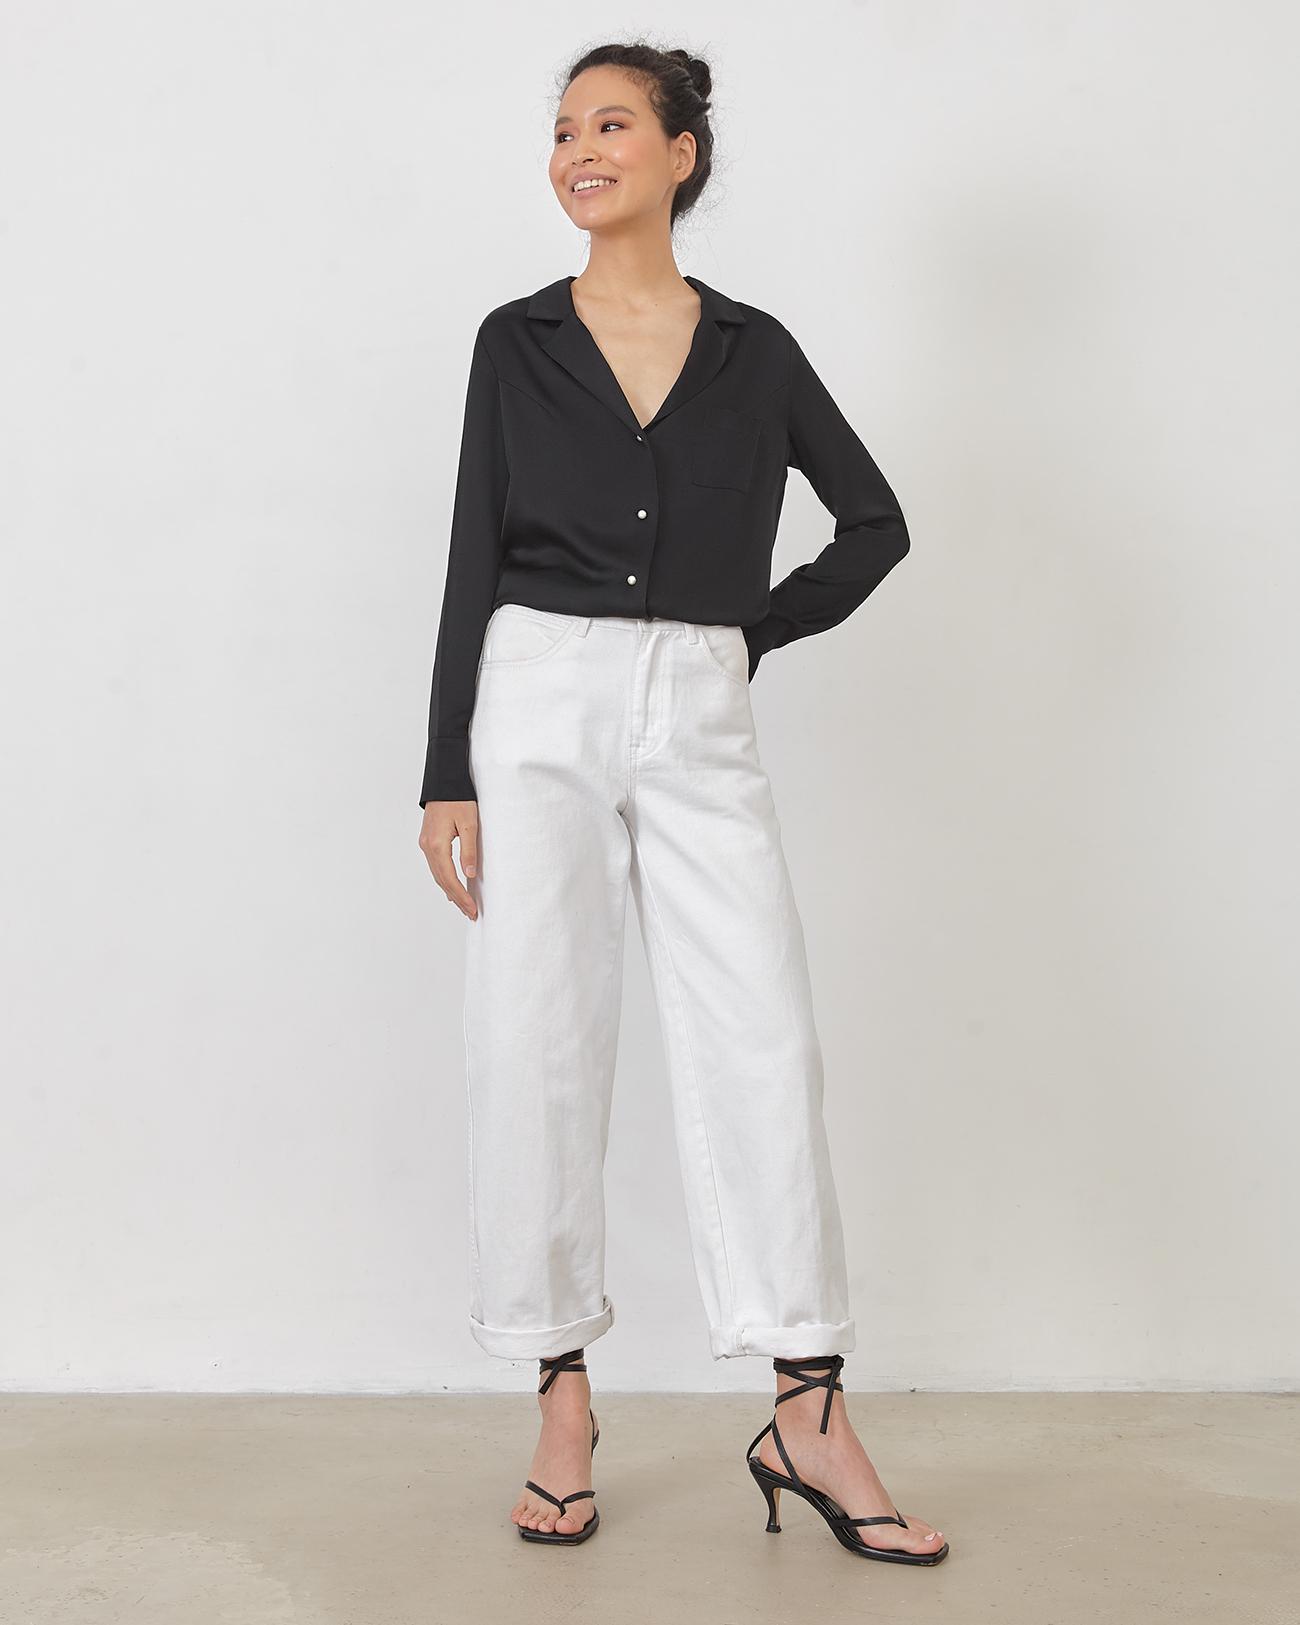 Блуза на пуговицах черного цвета фото